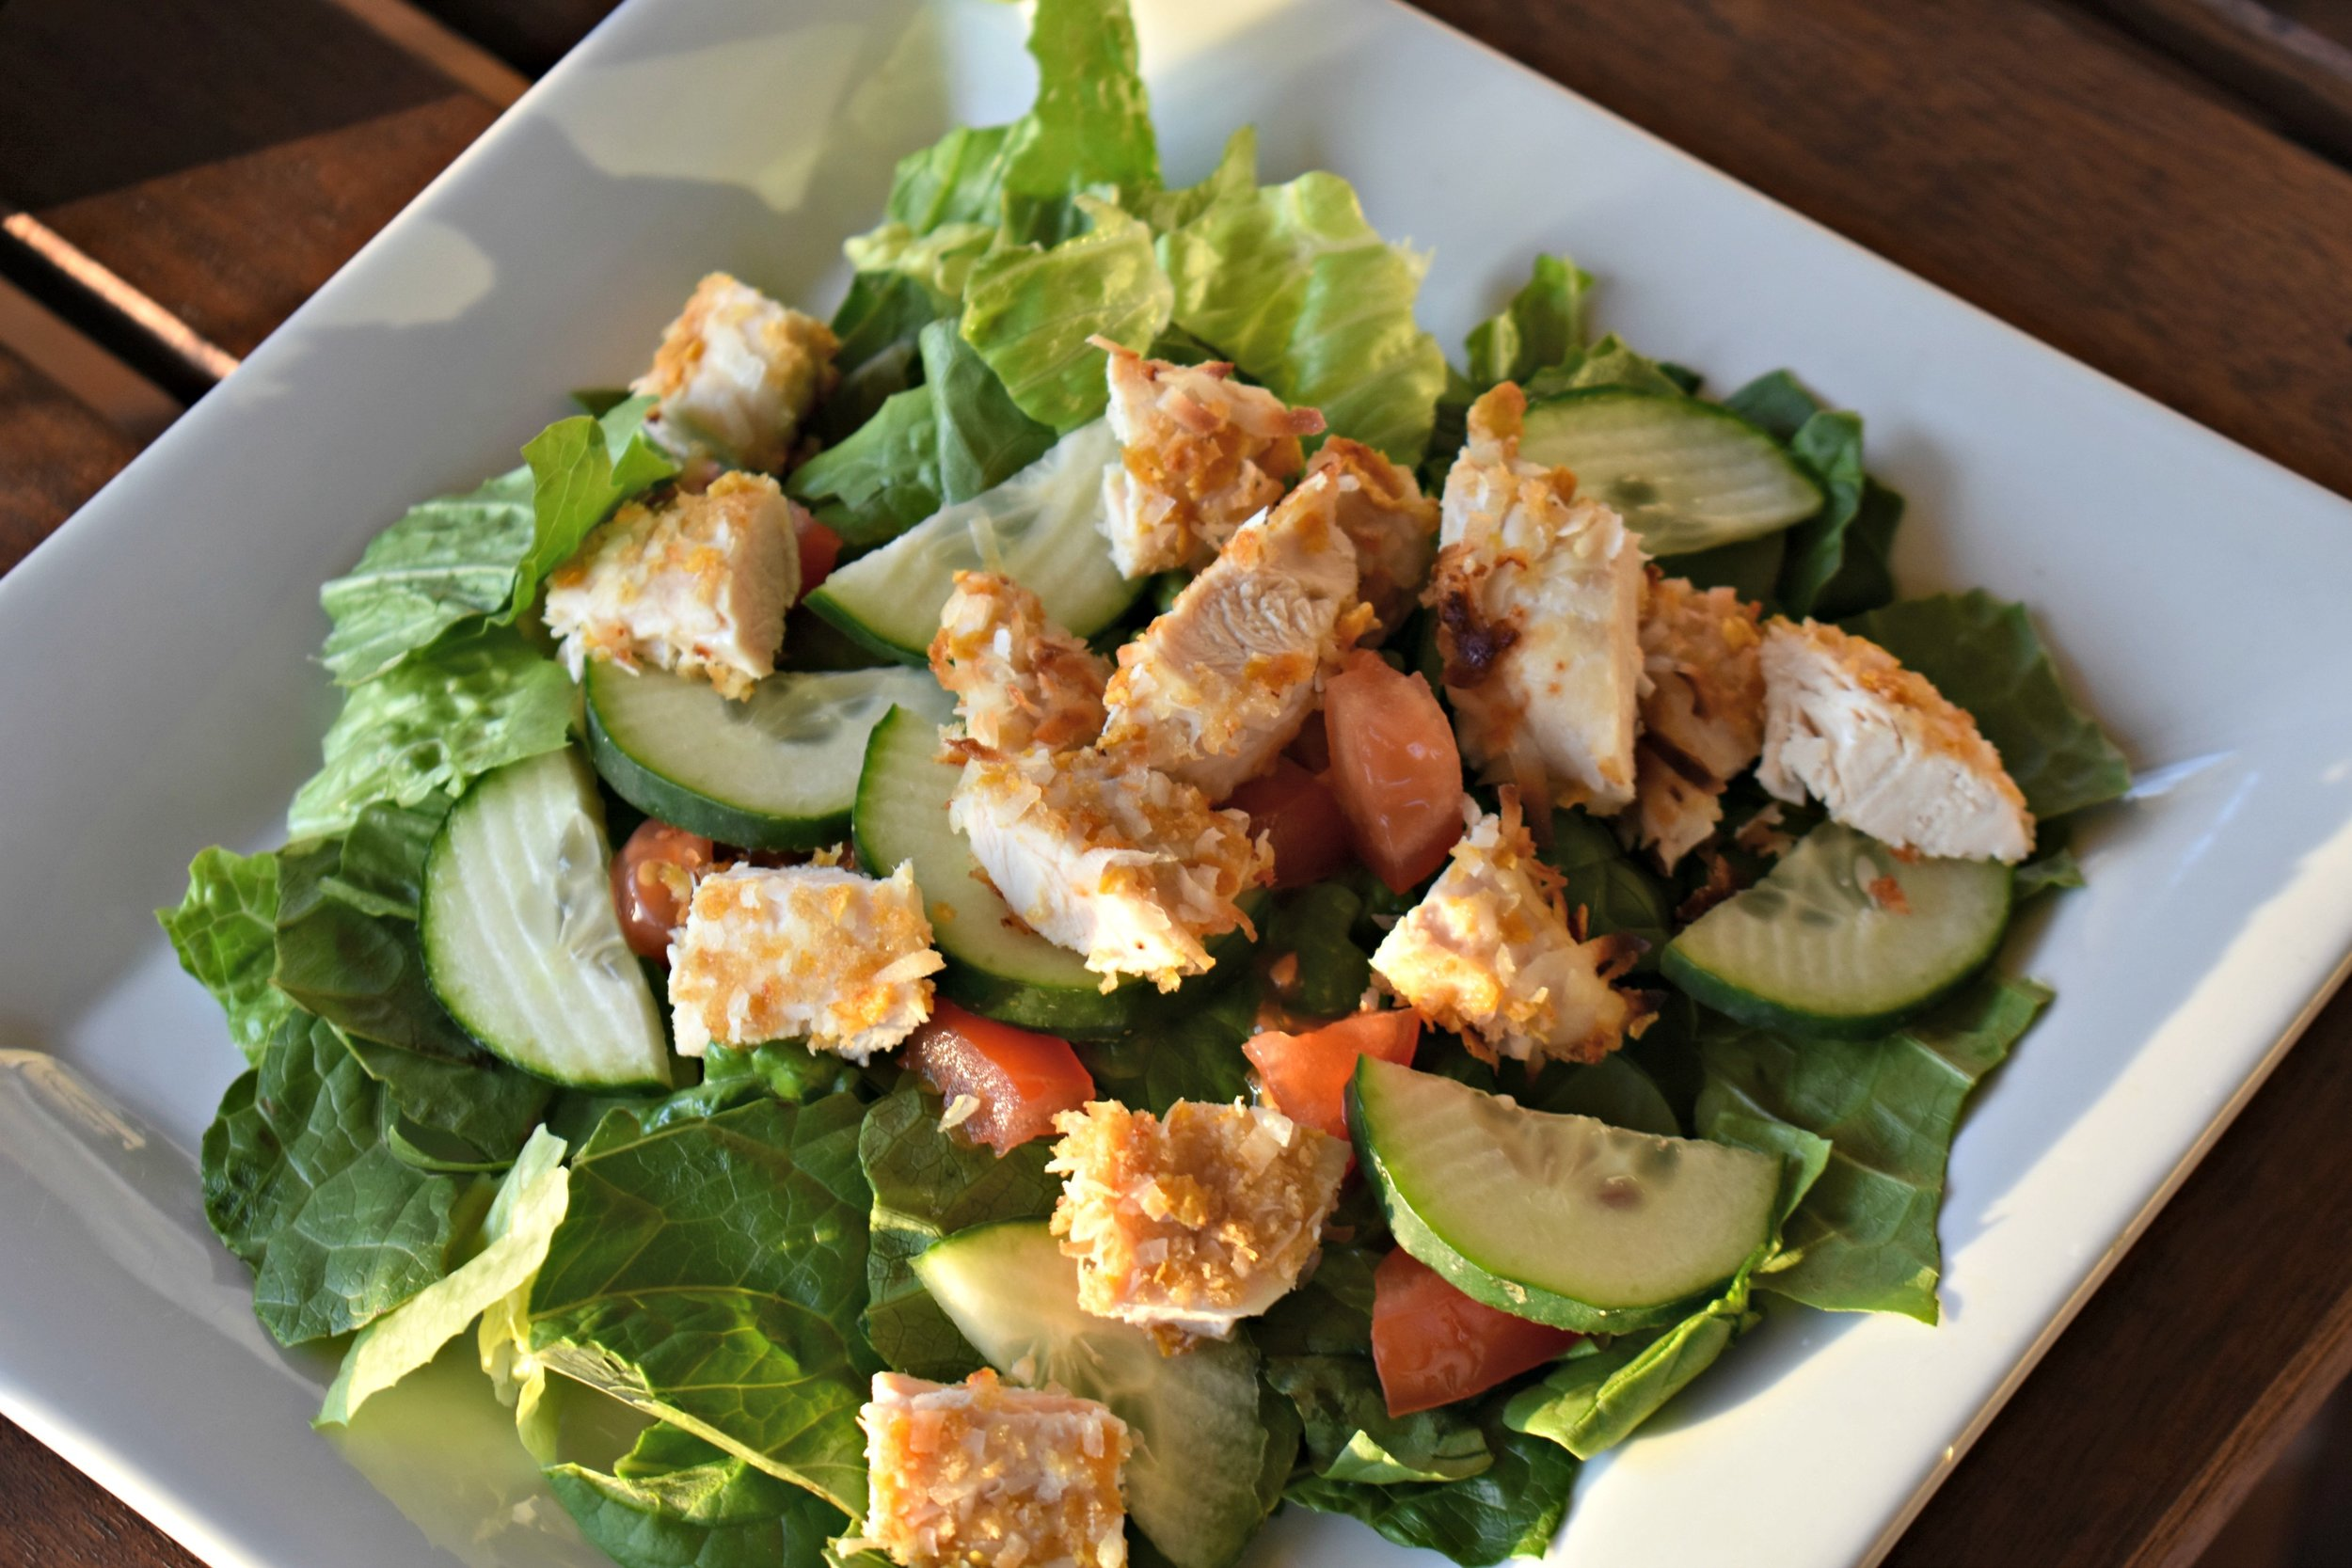 Coconut Chicken Salad with Honey Mustard Vinaigrette